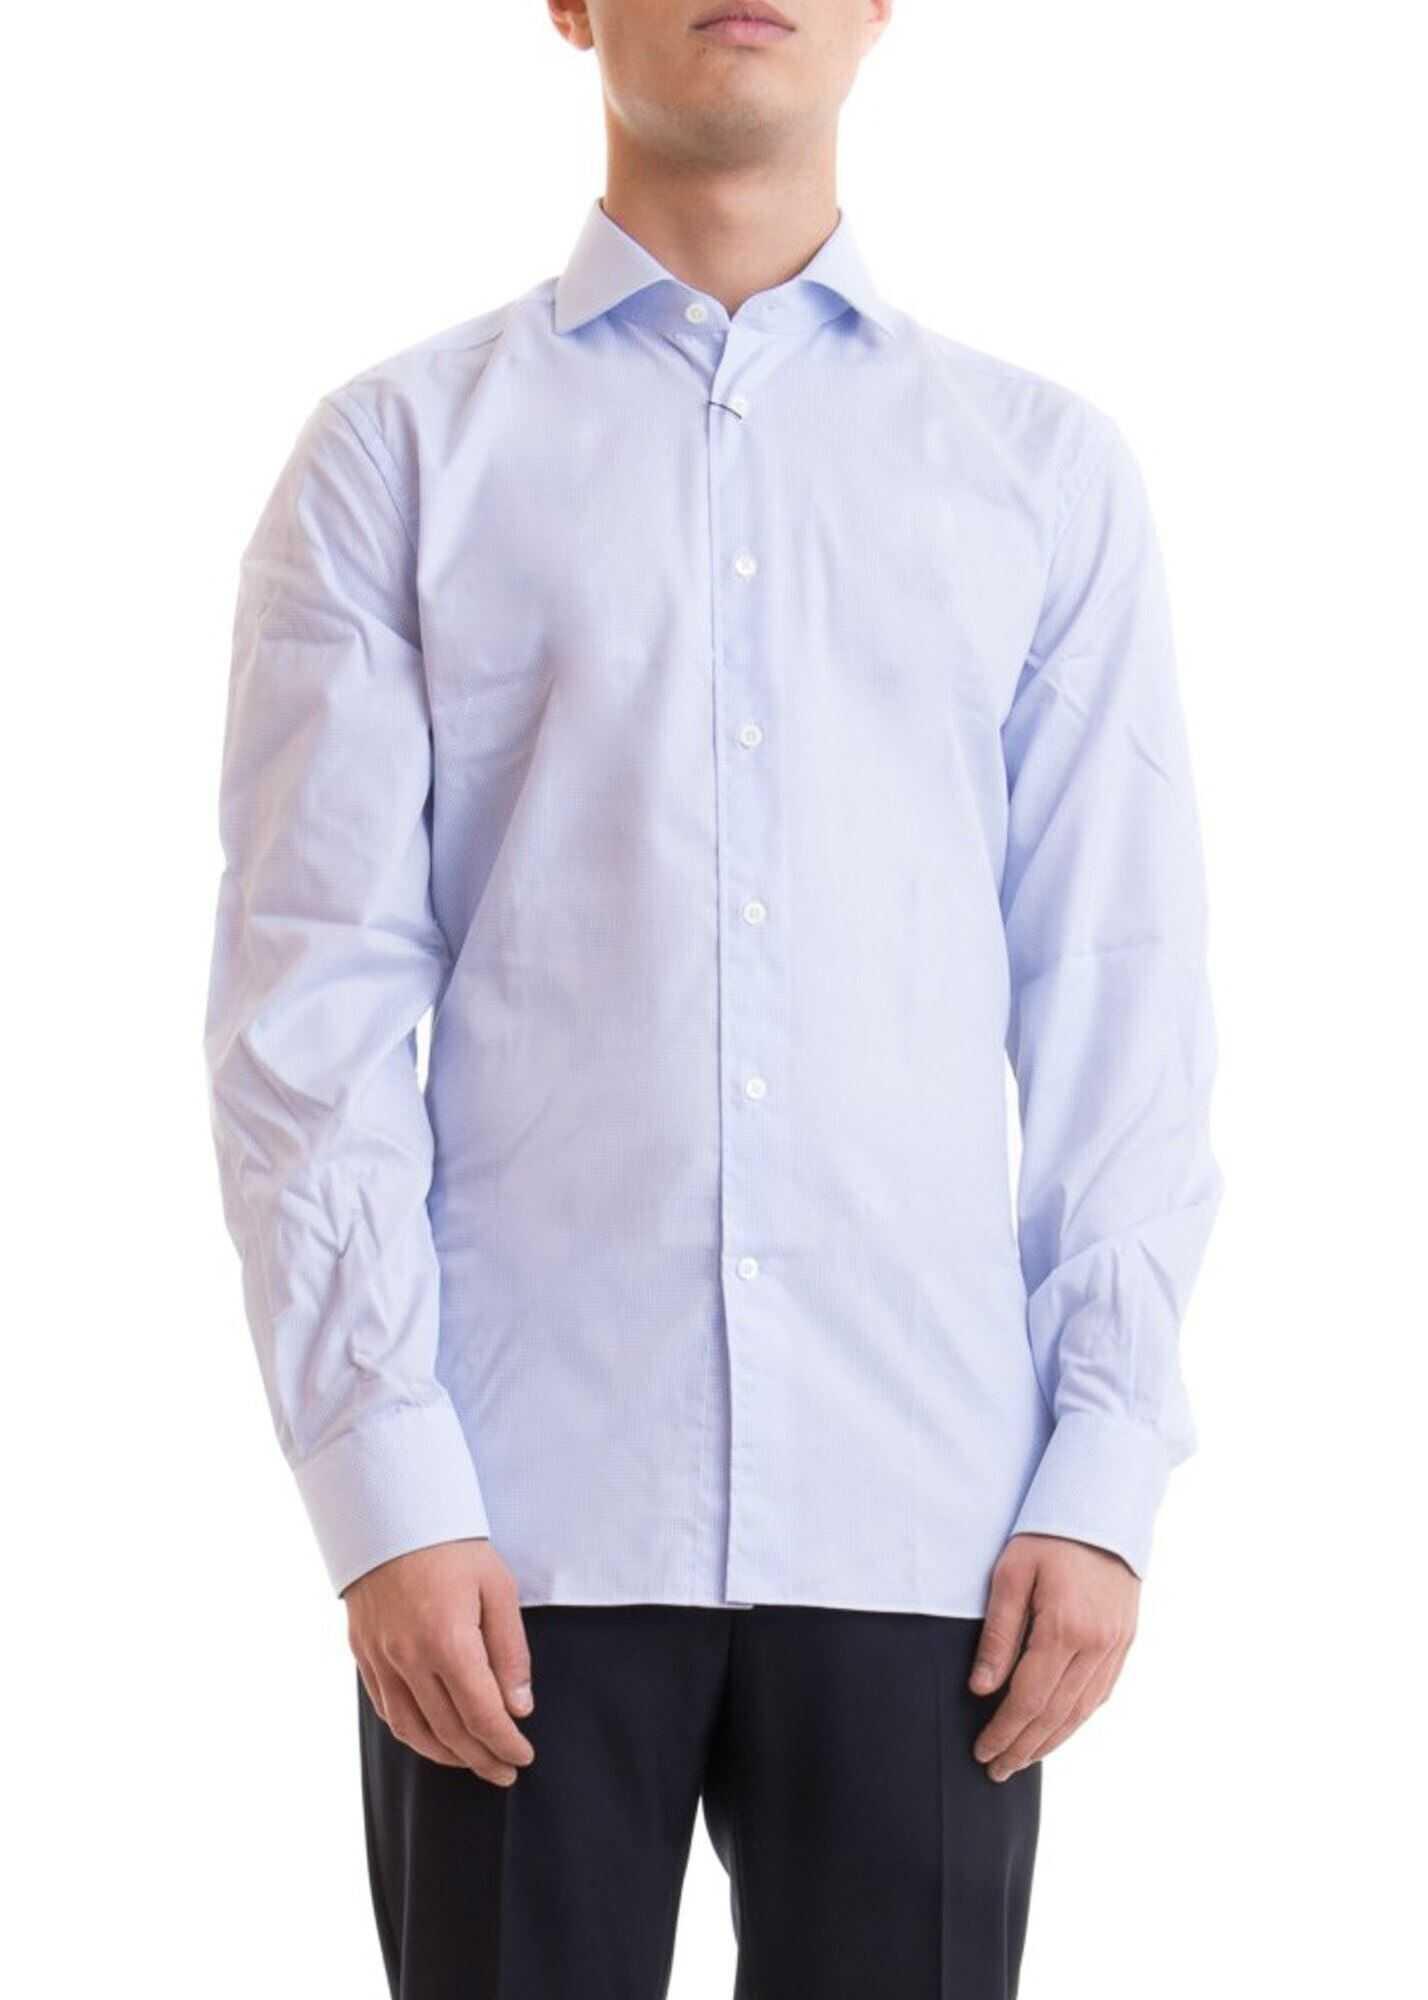 CORNELIANI Logo Patch Check Print Cotton Shirt Light Blue imagine